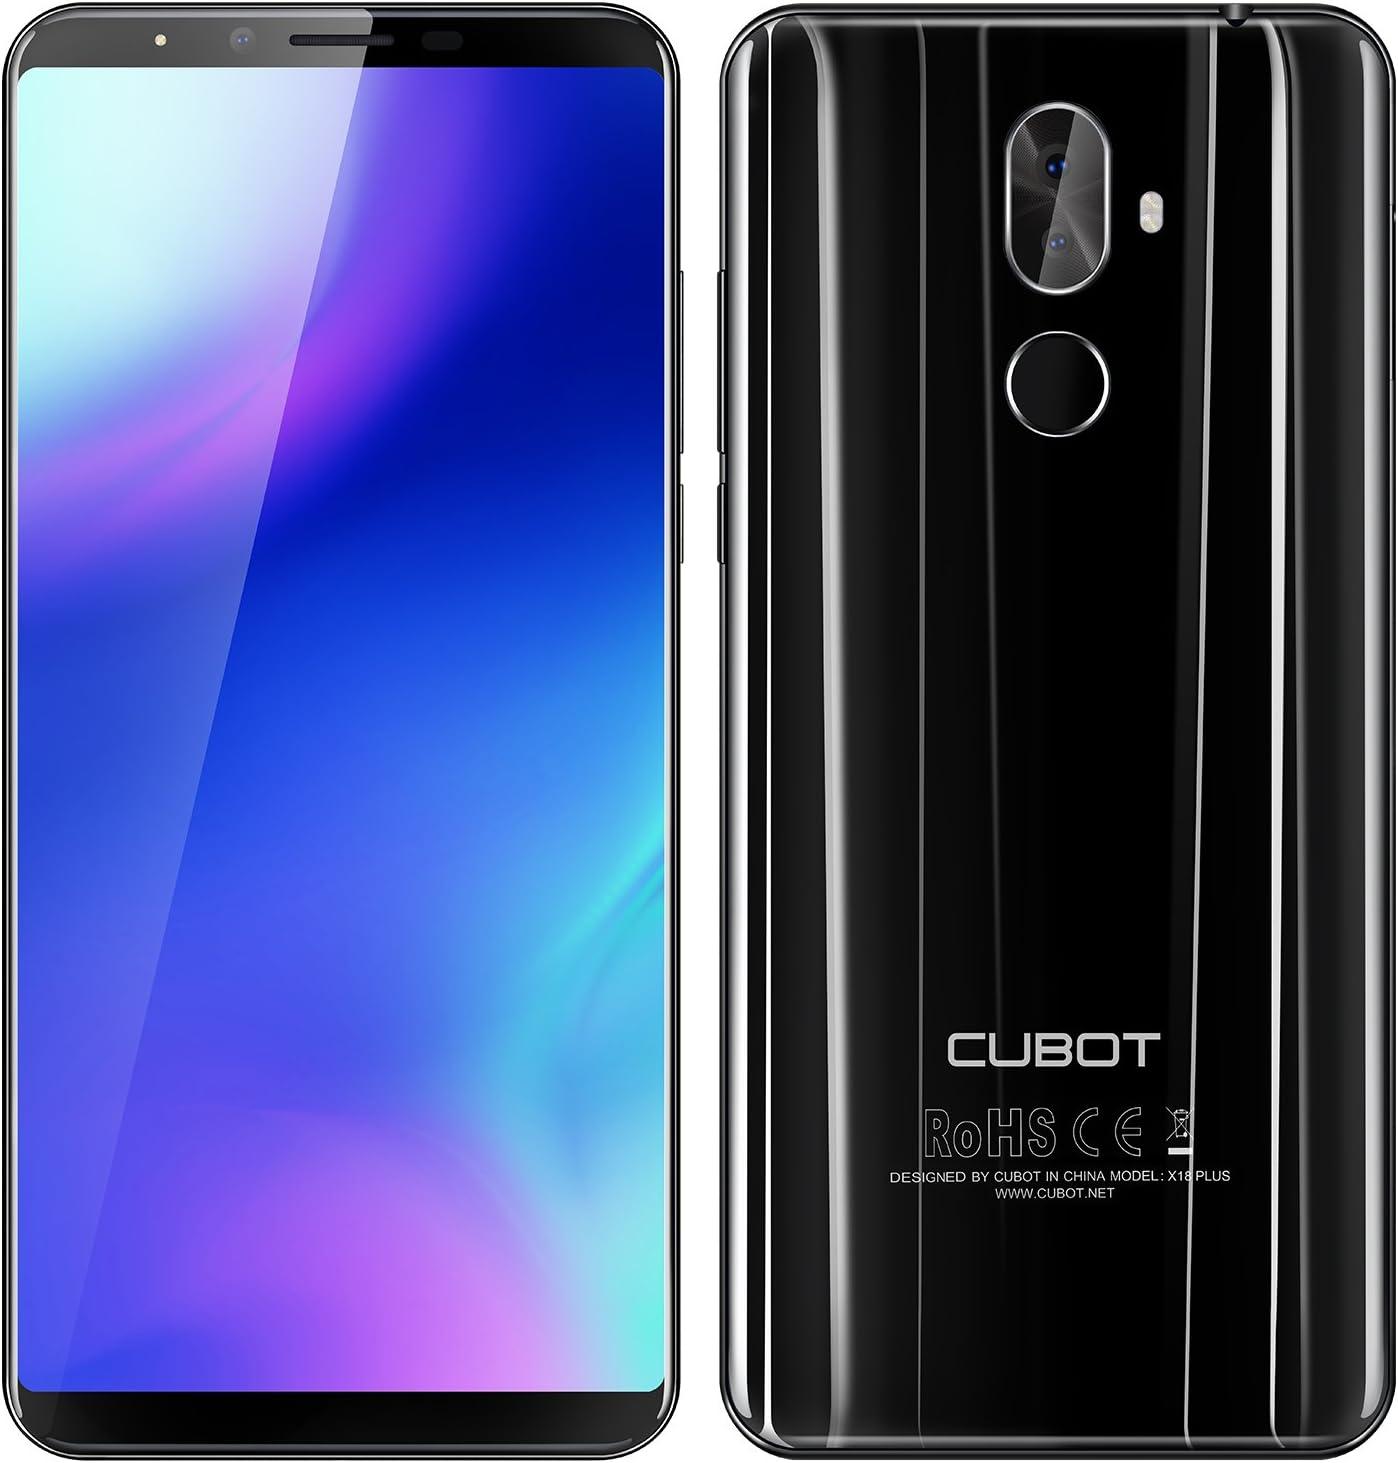 CUBOT X18 Plus - 5.99 Pulgadas FHD + (2160 x 1080) (proporción 18: 9) Android 8.0 4G teléfono Inteligente, Octa-Core 1.5GHz 4GB + 64GB, cámara Triple (20MP + 2MP + 13MP), batería 4000mAh: Cubot-Spain: Amazon.es: Electrónica